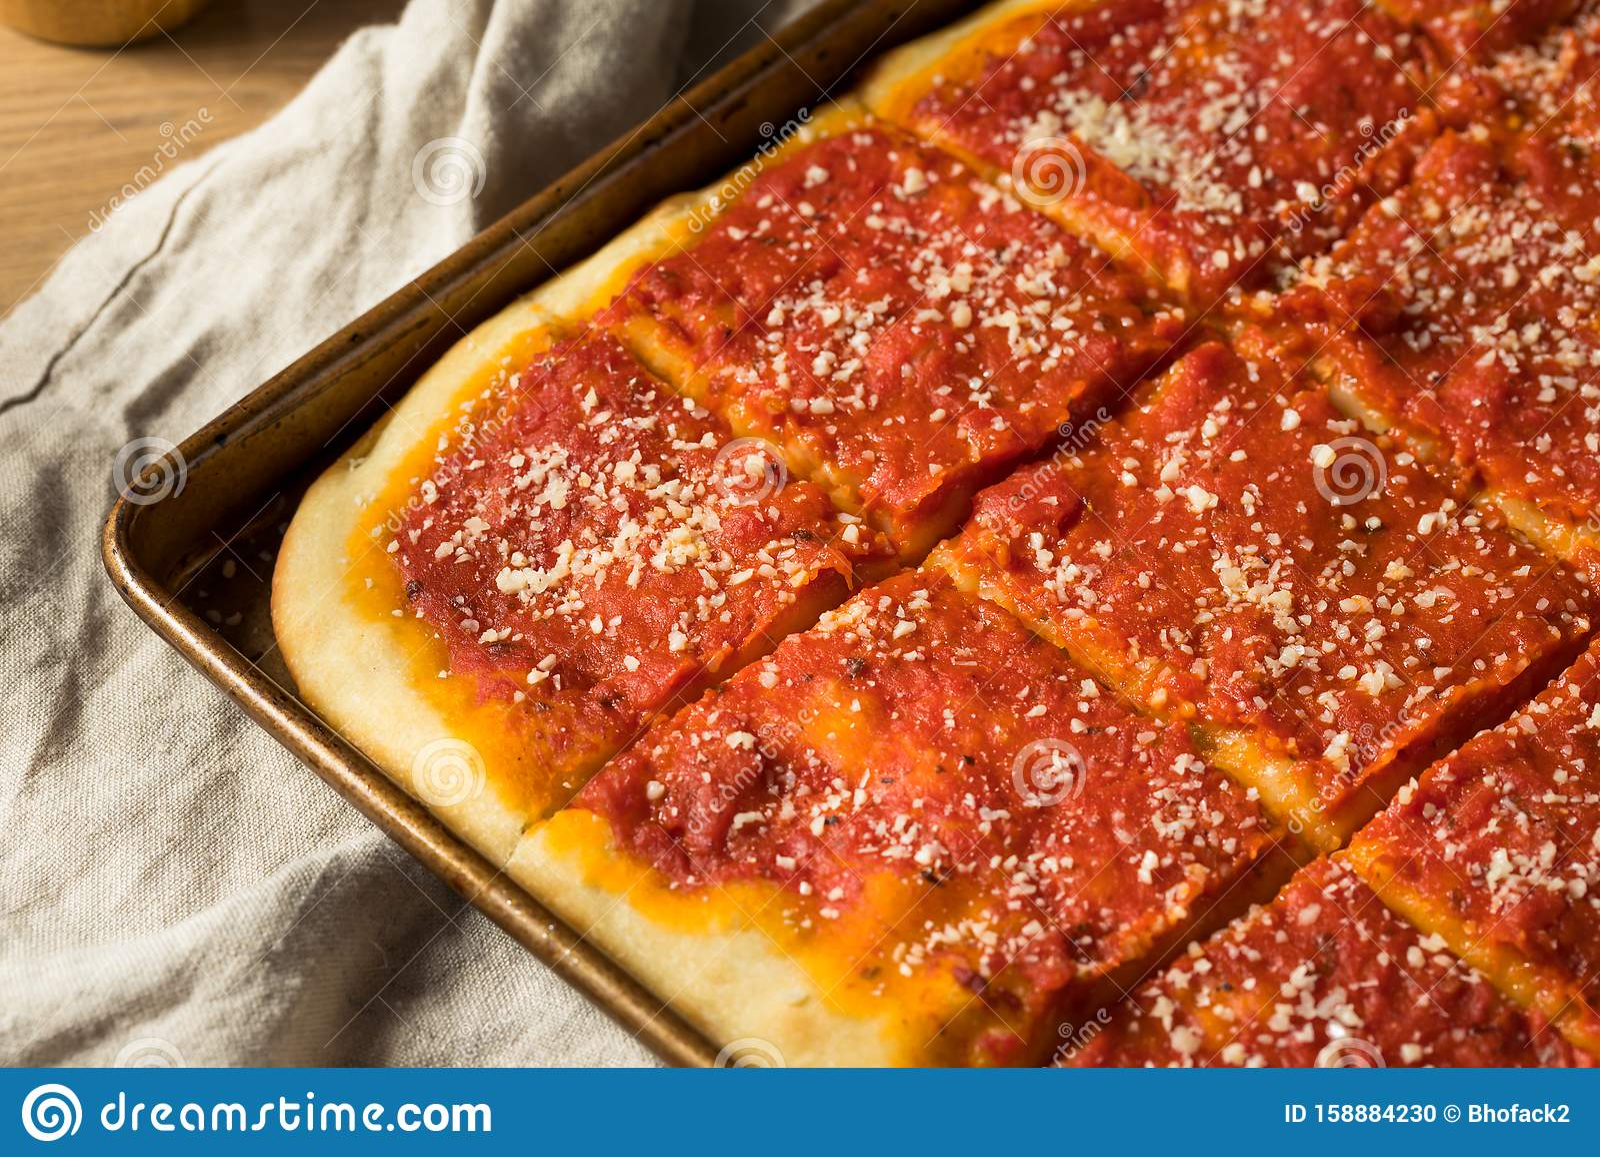 Homemade Philadelphia Tomato Pie Stock Photo Image Of Restaurant Traditional 158884230